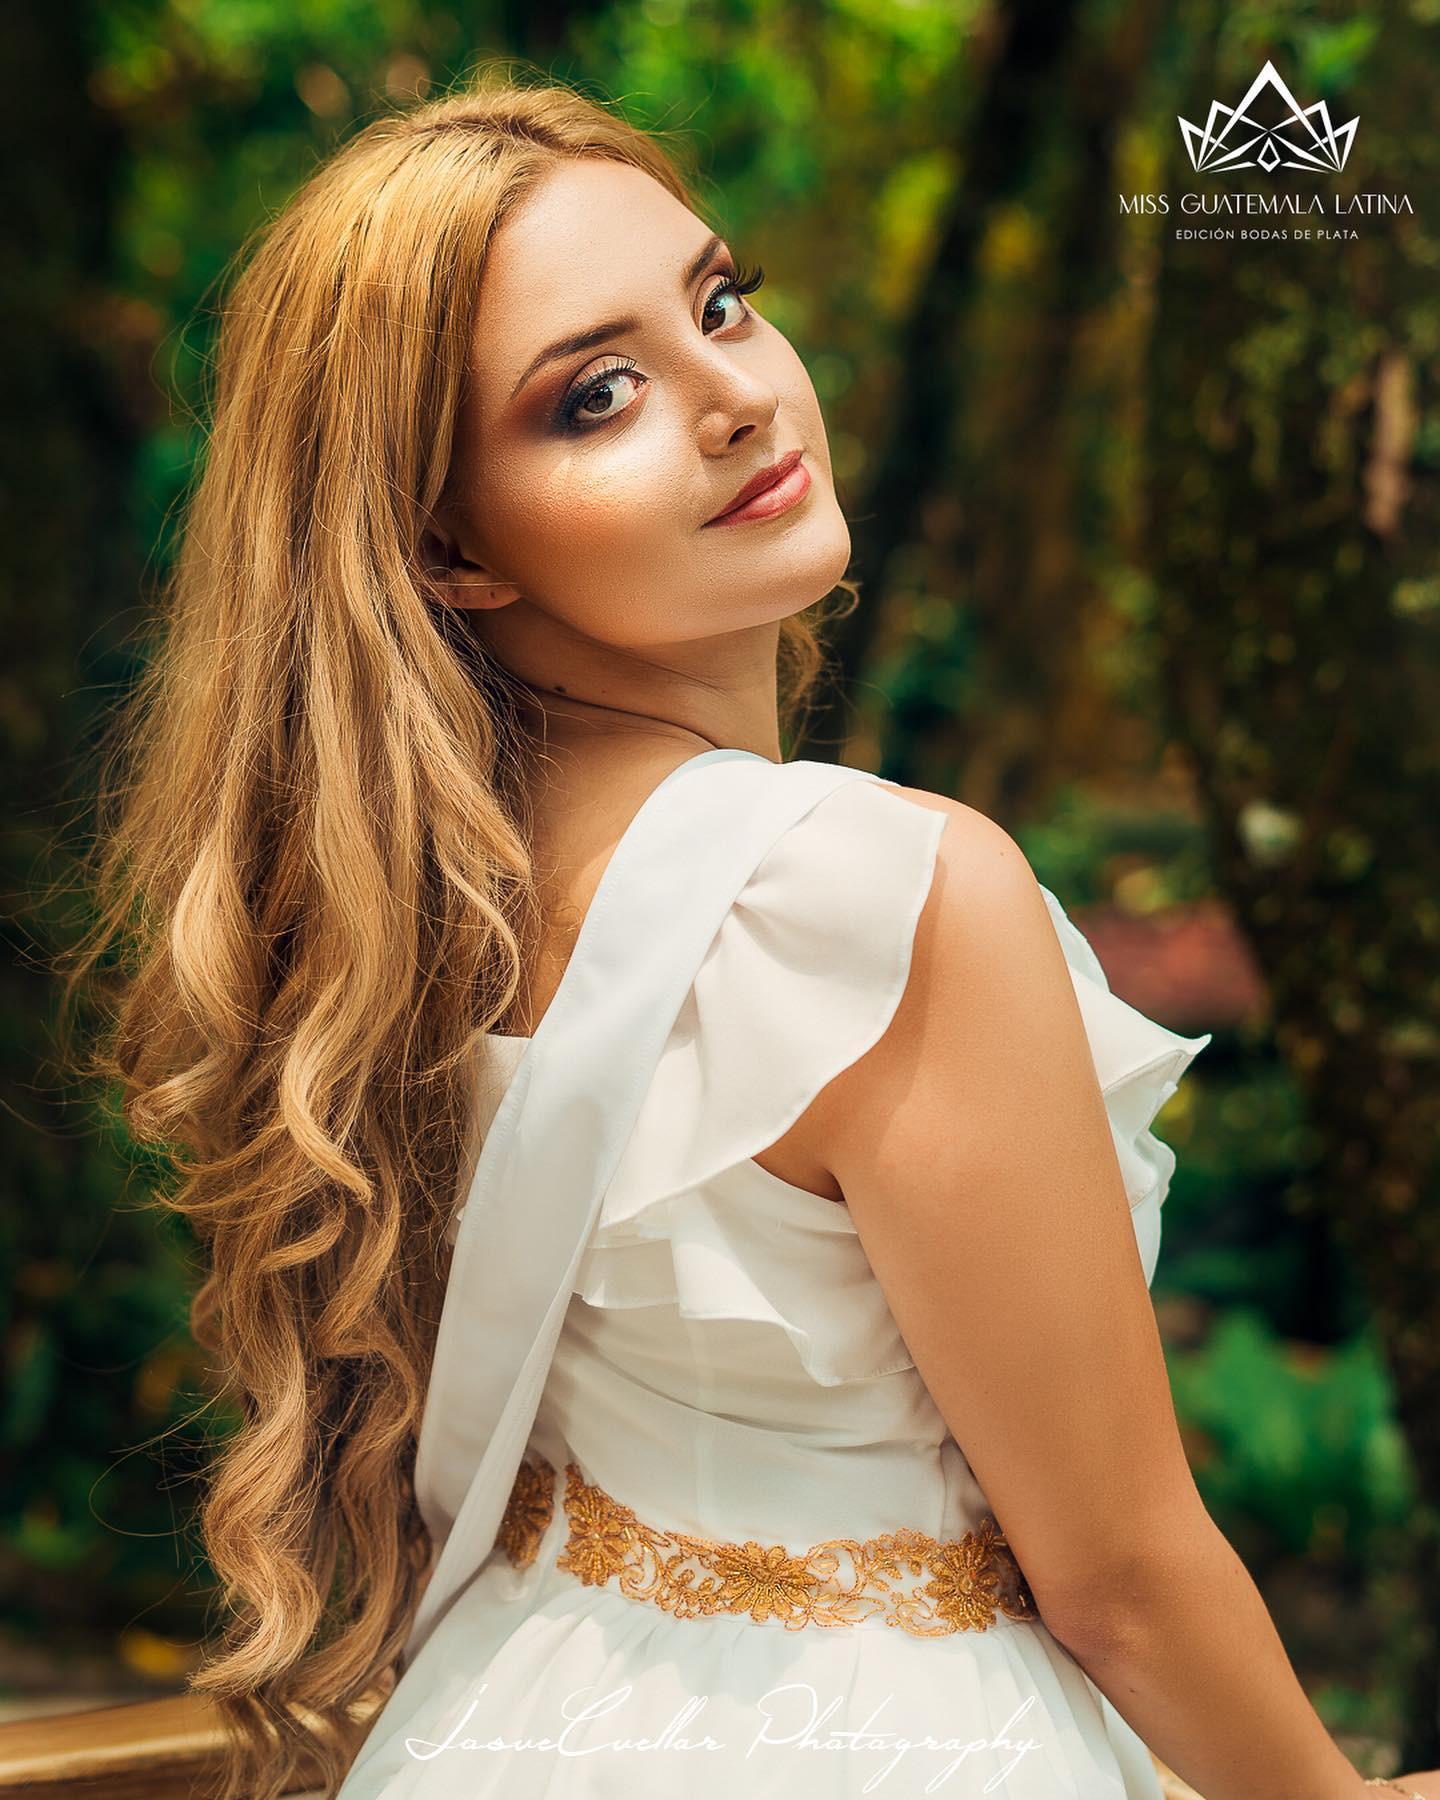 candidatas a miss guatemala latina 2021. final: 30 de abril. - Página 11 BFNTEQ